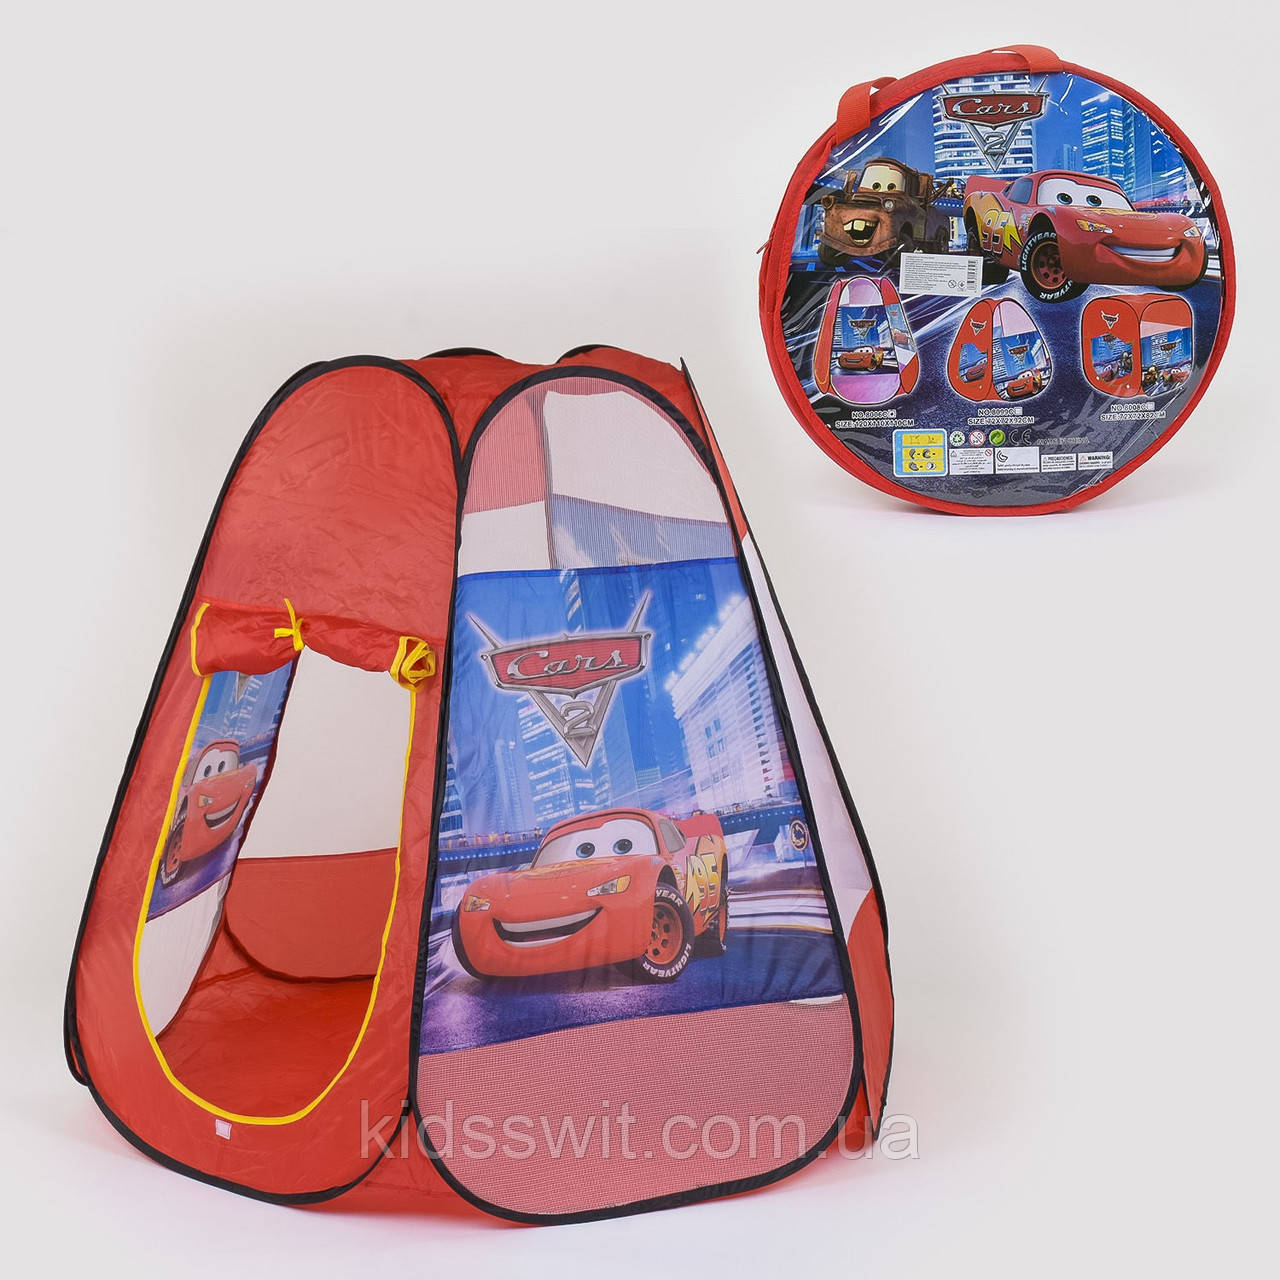 "Палатка детская ""Тачки"" 120 х110 х110 см, в сумке 8006 C"